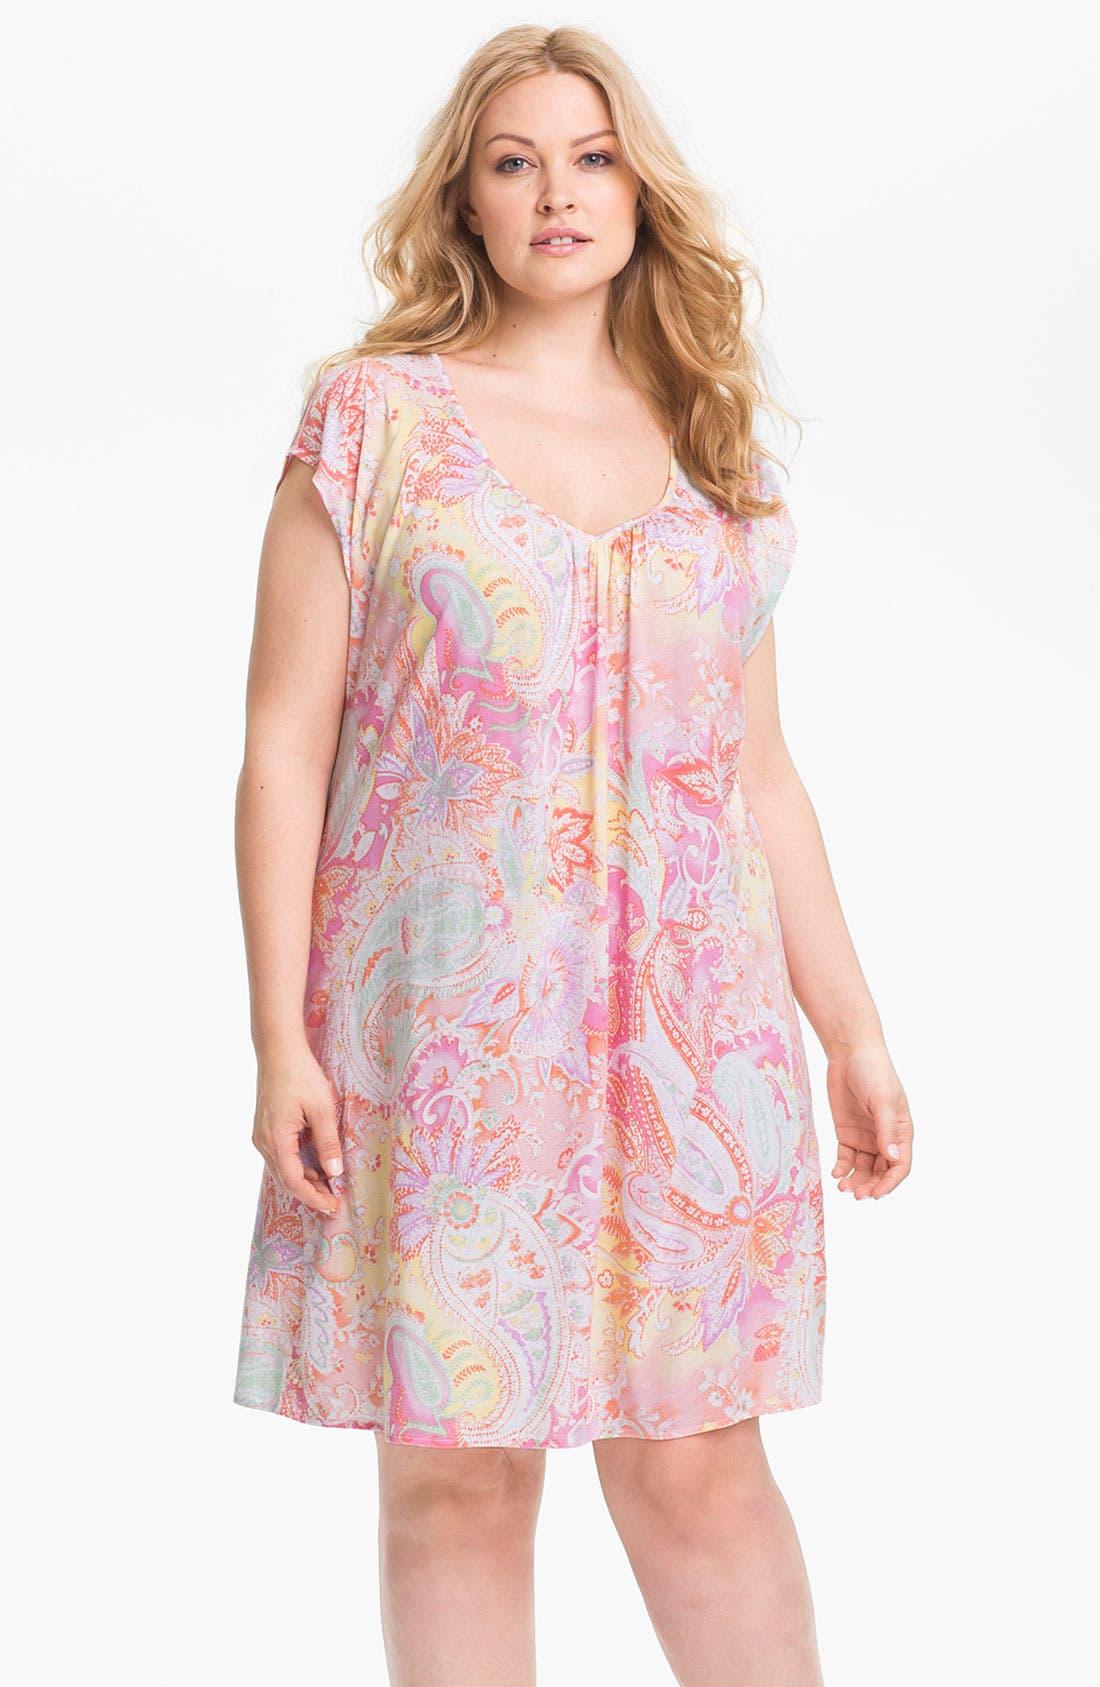 Alternate Image 1 Selected - Lauren Ralph Lauren Sleepwear Knit Nightgown (Plus)